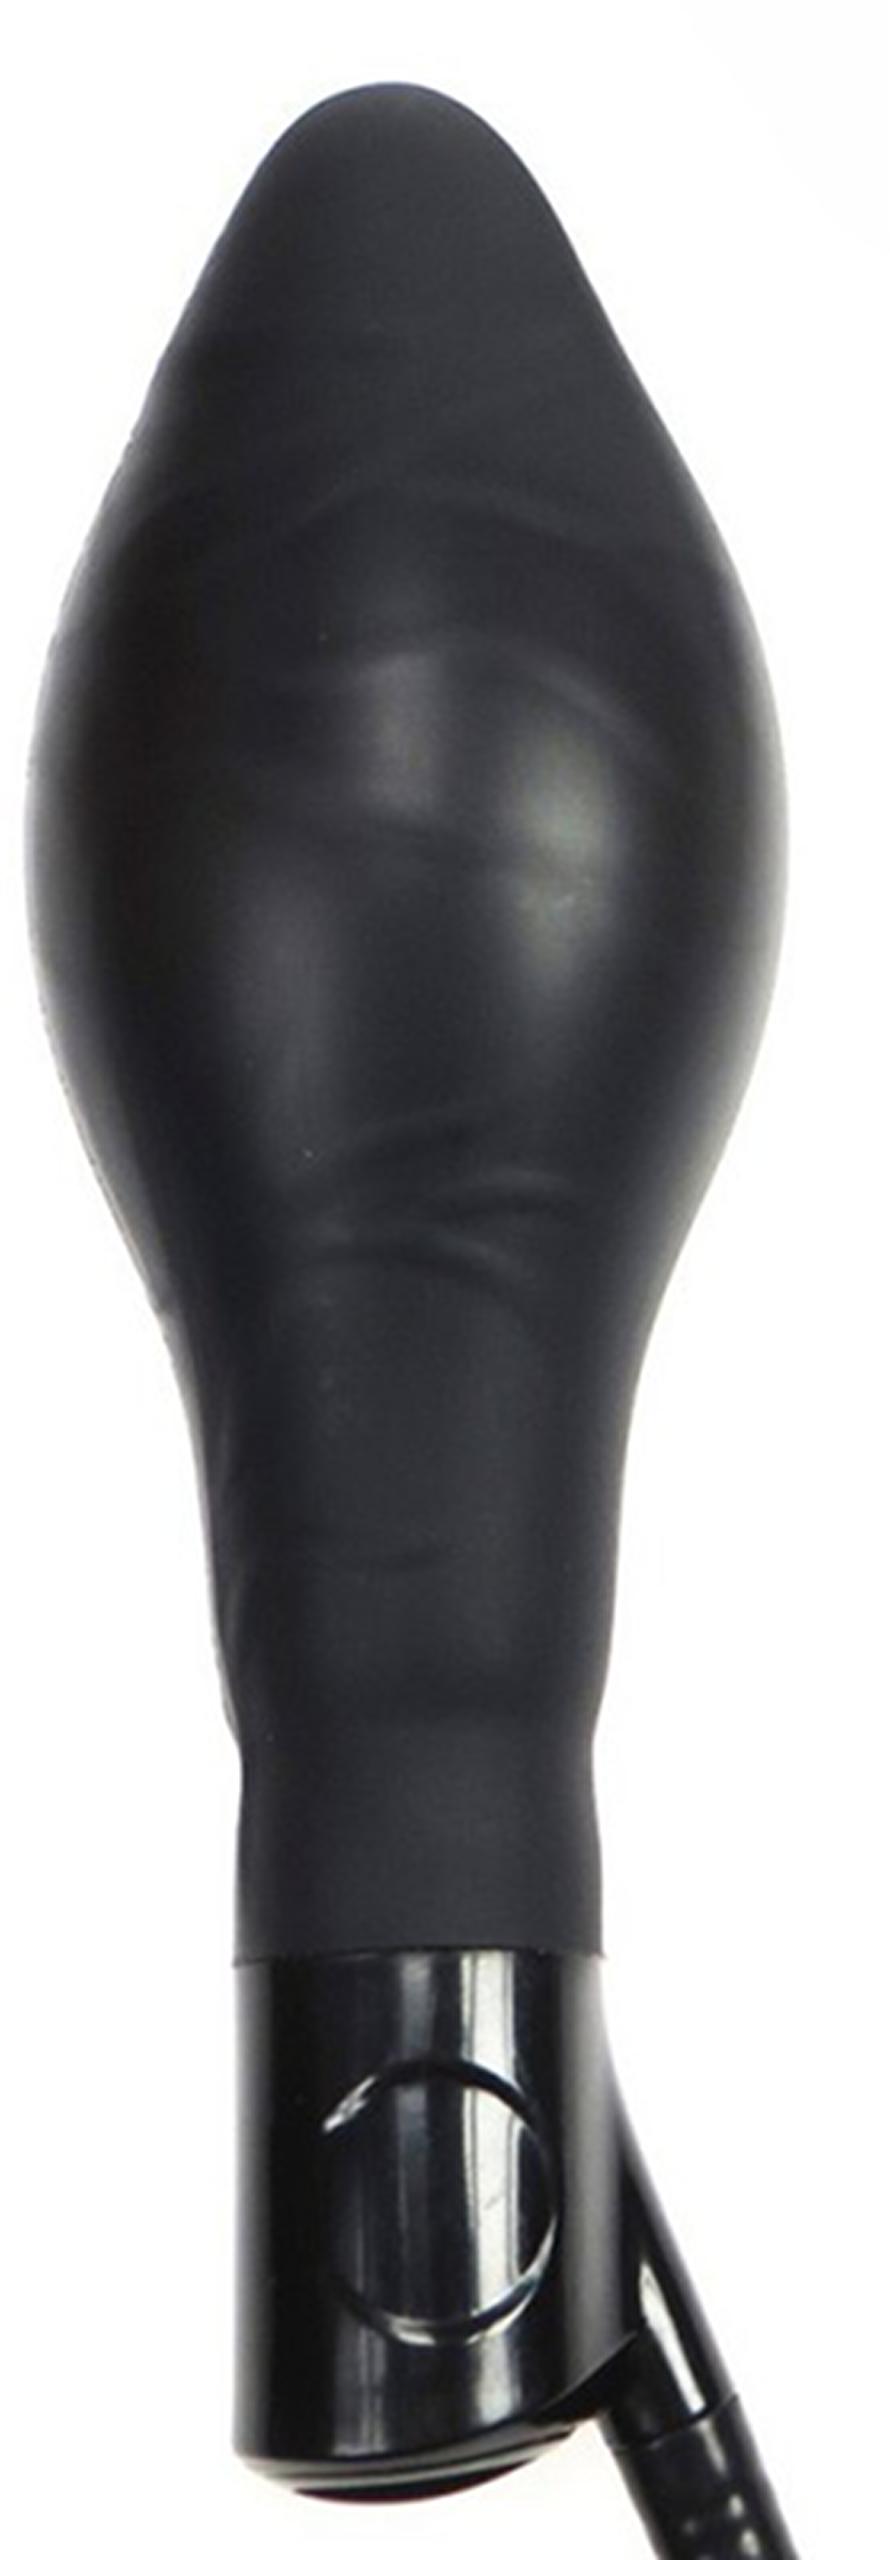 Czarne cipki do pobrania